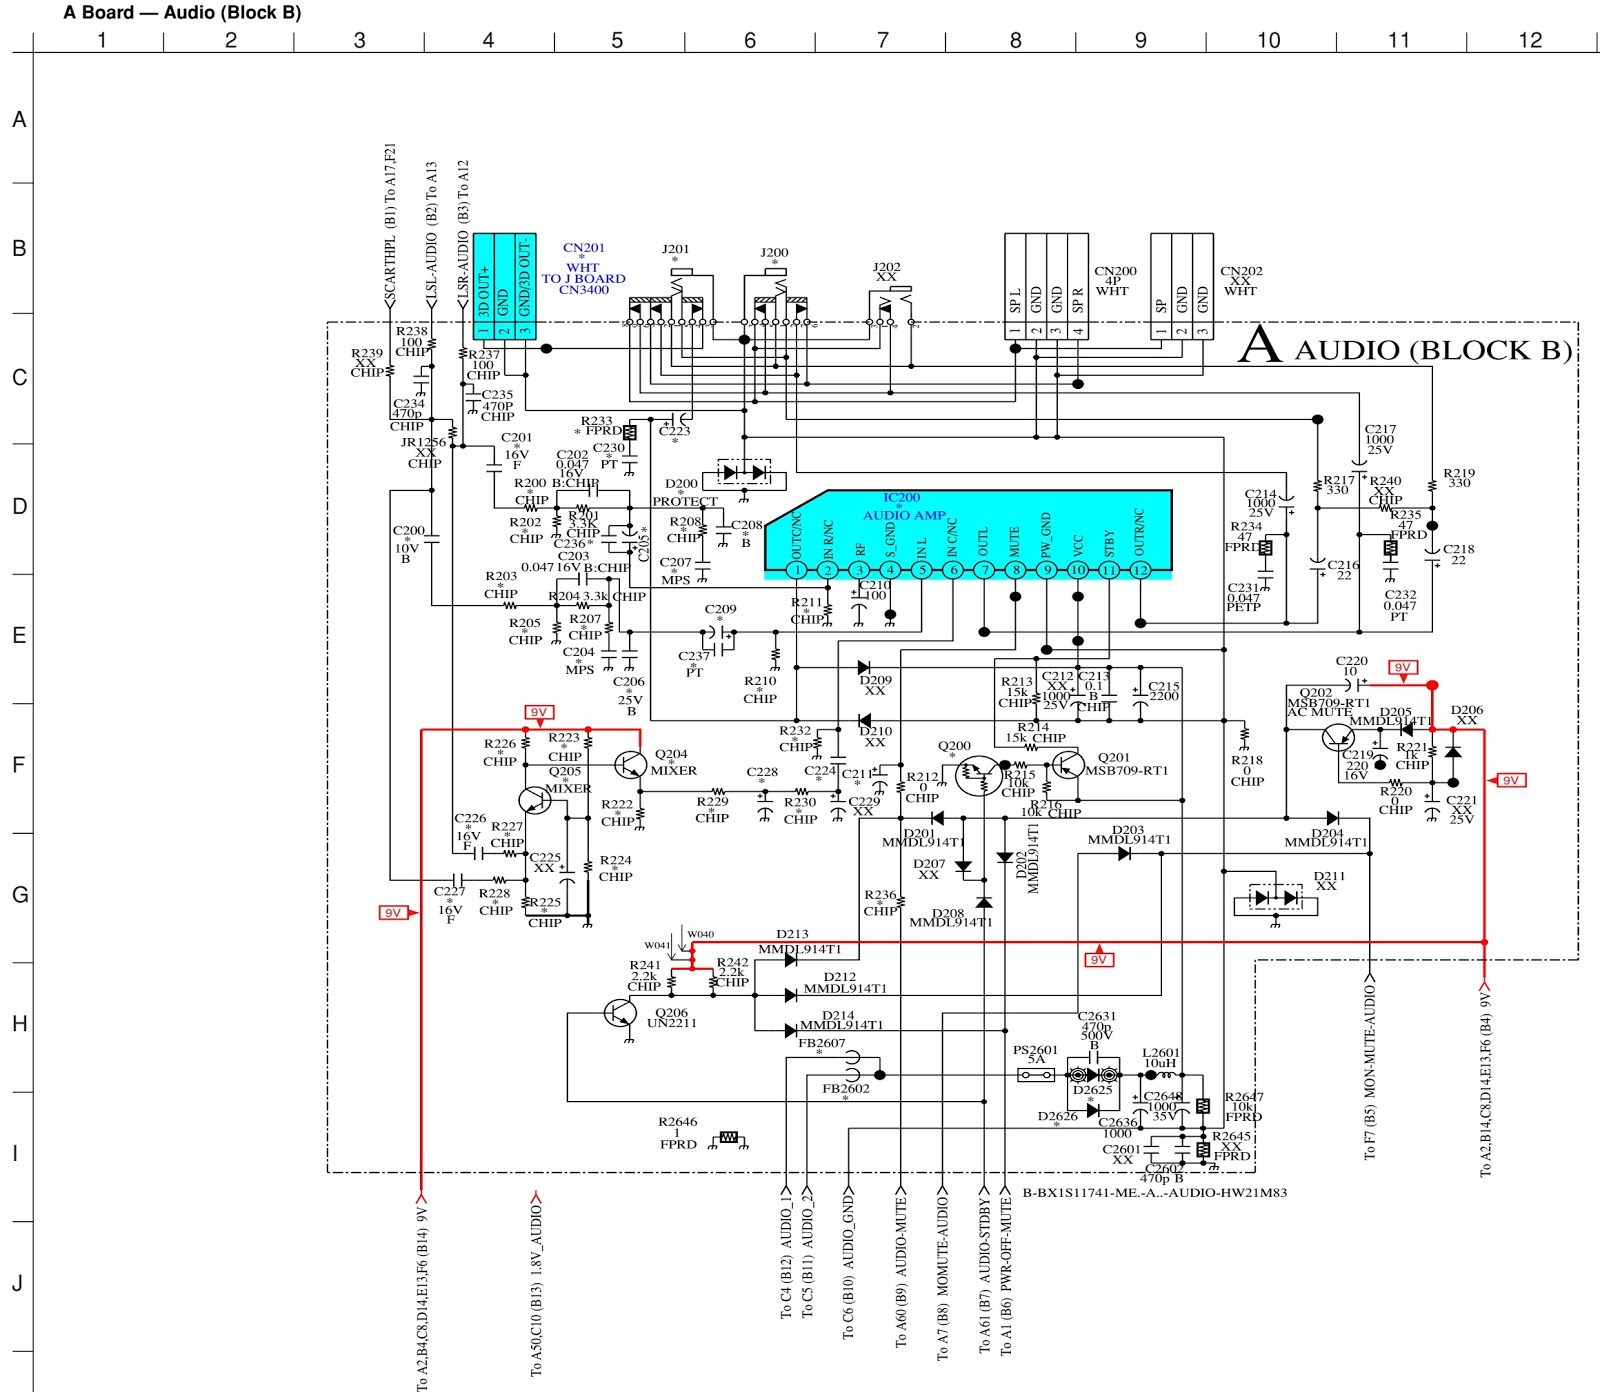 sony tv circuit diagram wiring diagram name sony tv circuit diagram pdf sony tv circuit diagram [ 1600 x 1399 Pixel ]